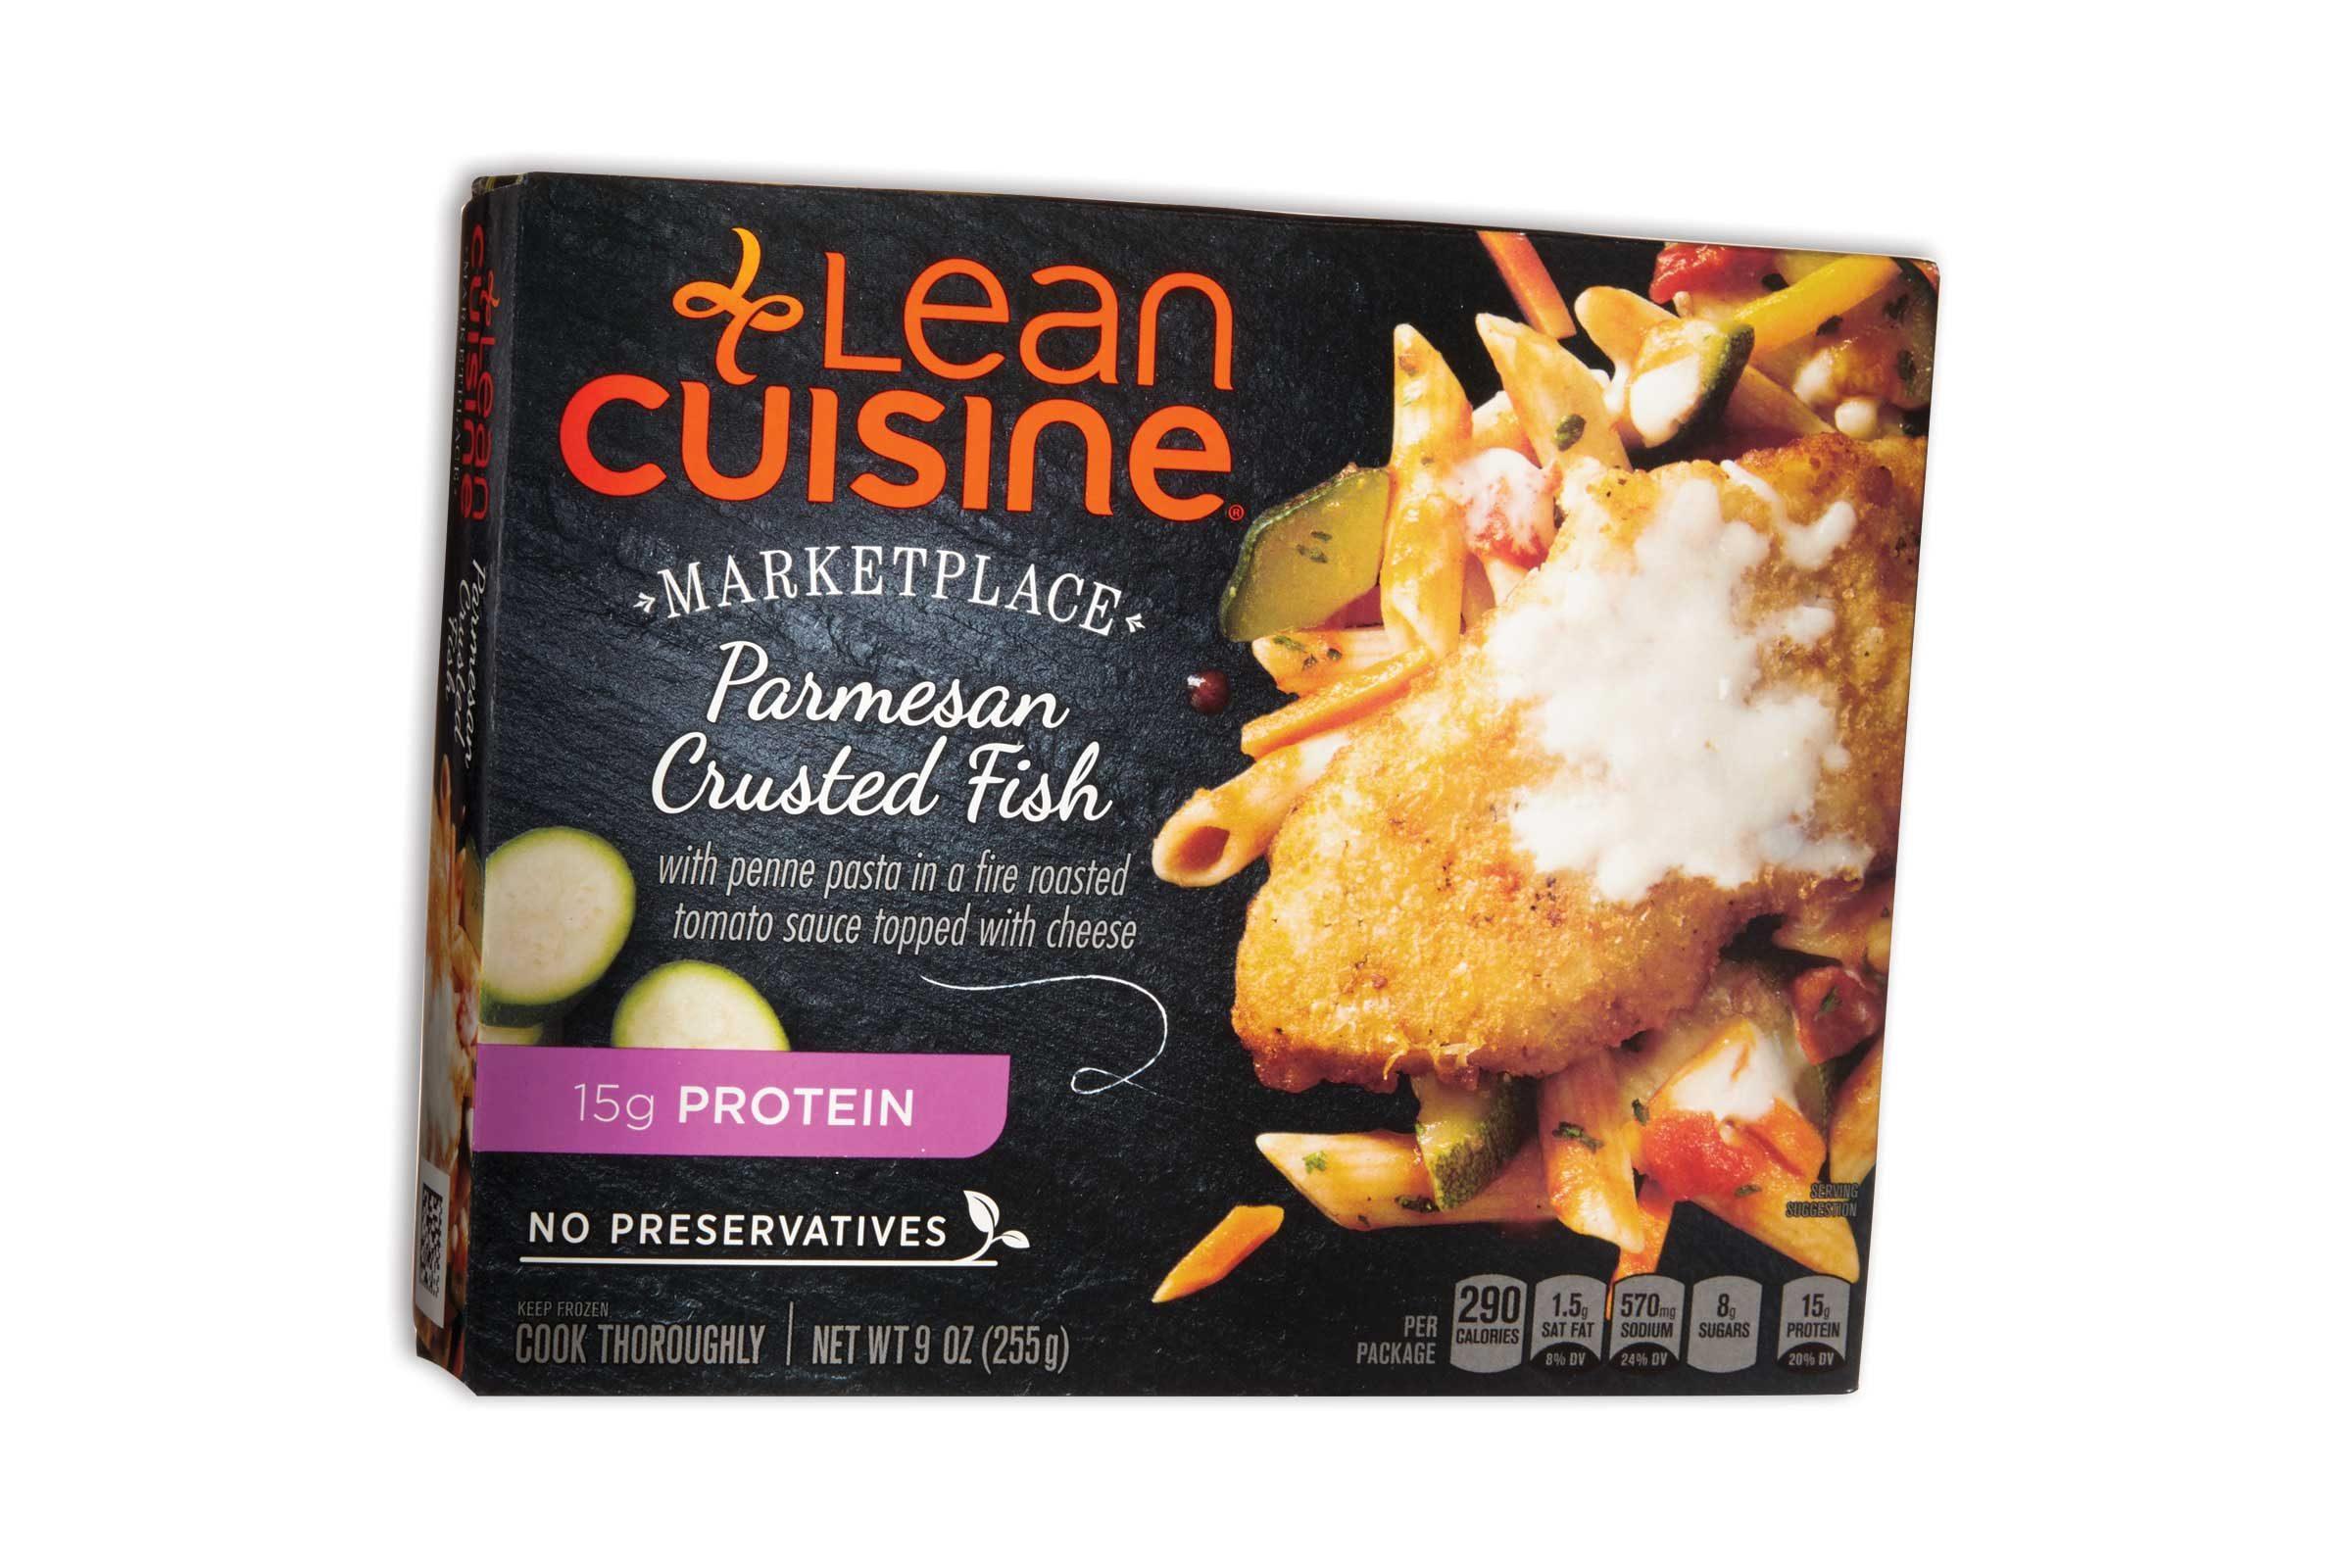 Healthy frozen meals 25 low calorie options reader 39 s digest - Are lean cuisines healthy ...